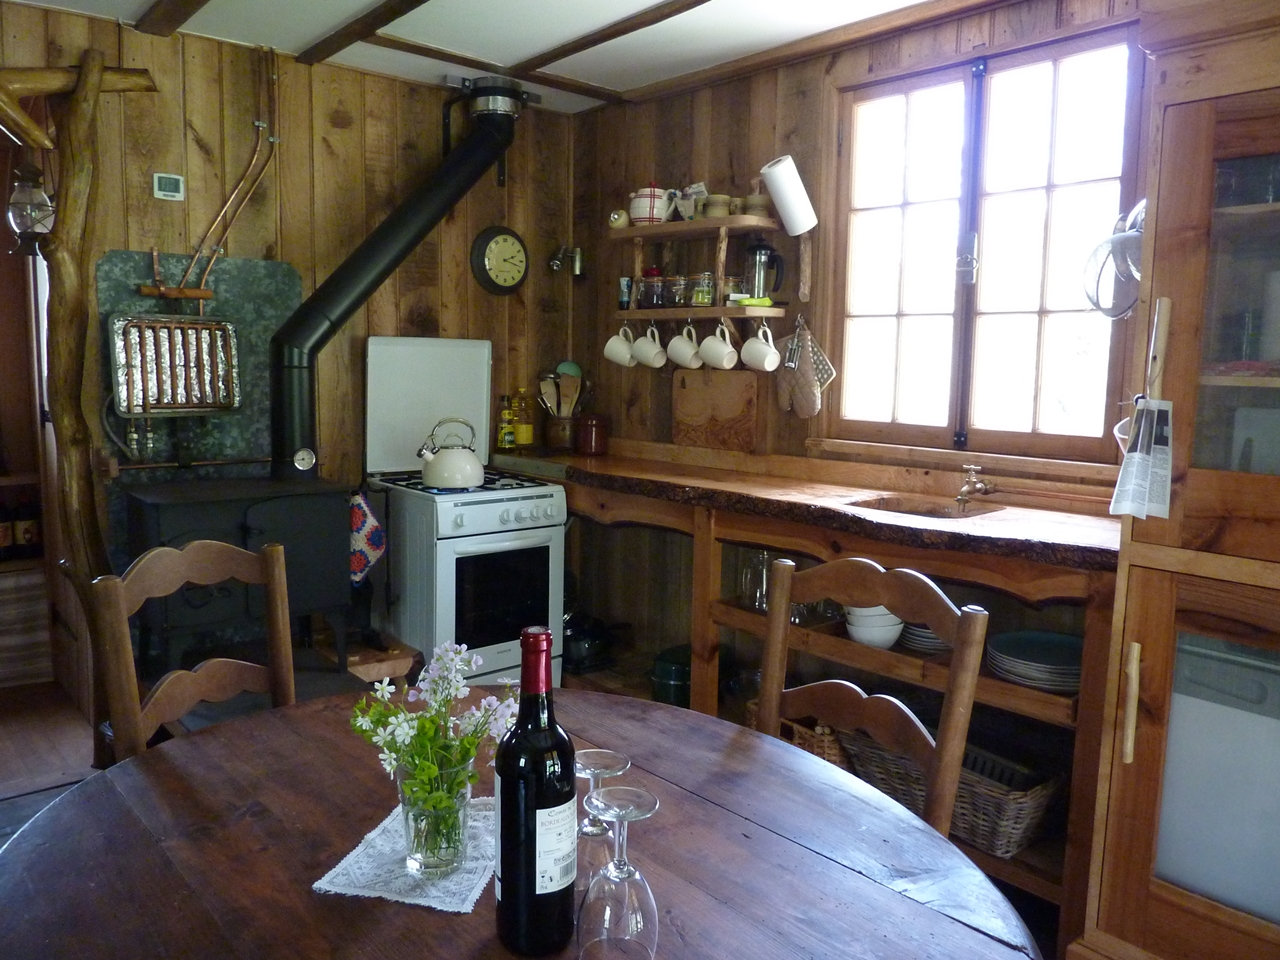 Gallery: Poacheru0027s Cabin, A Secluded Hideaway For Two